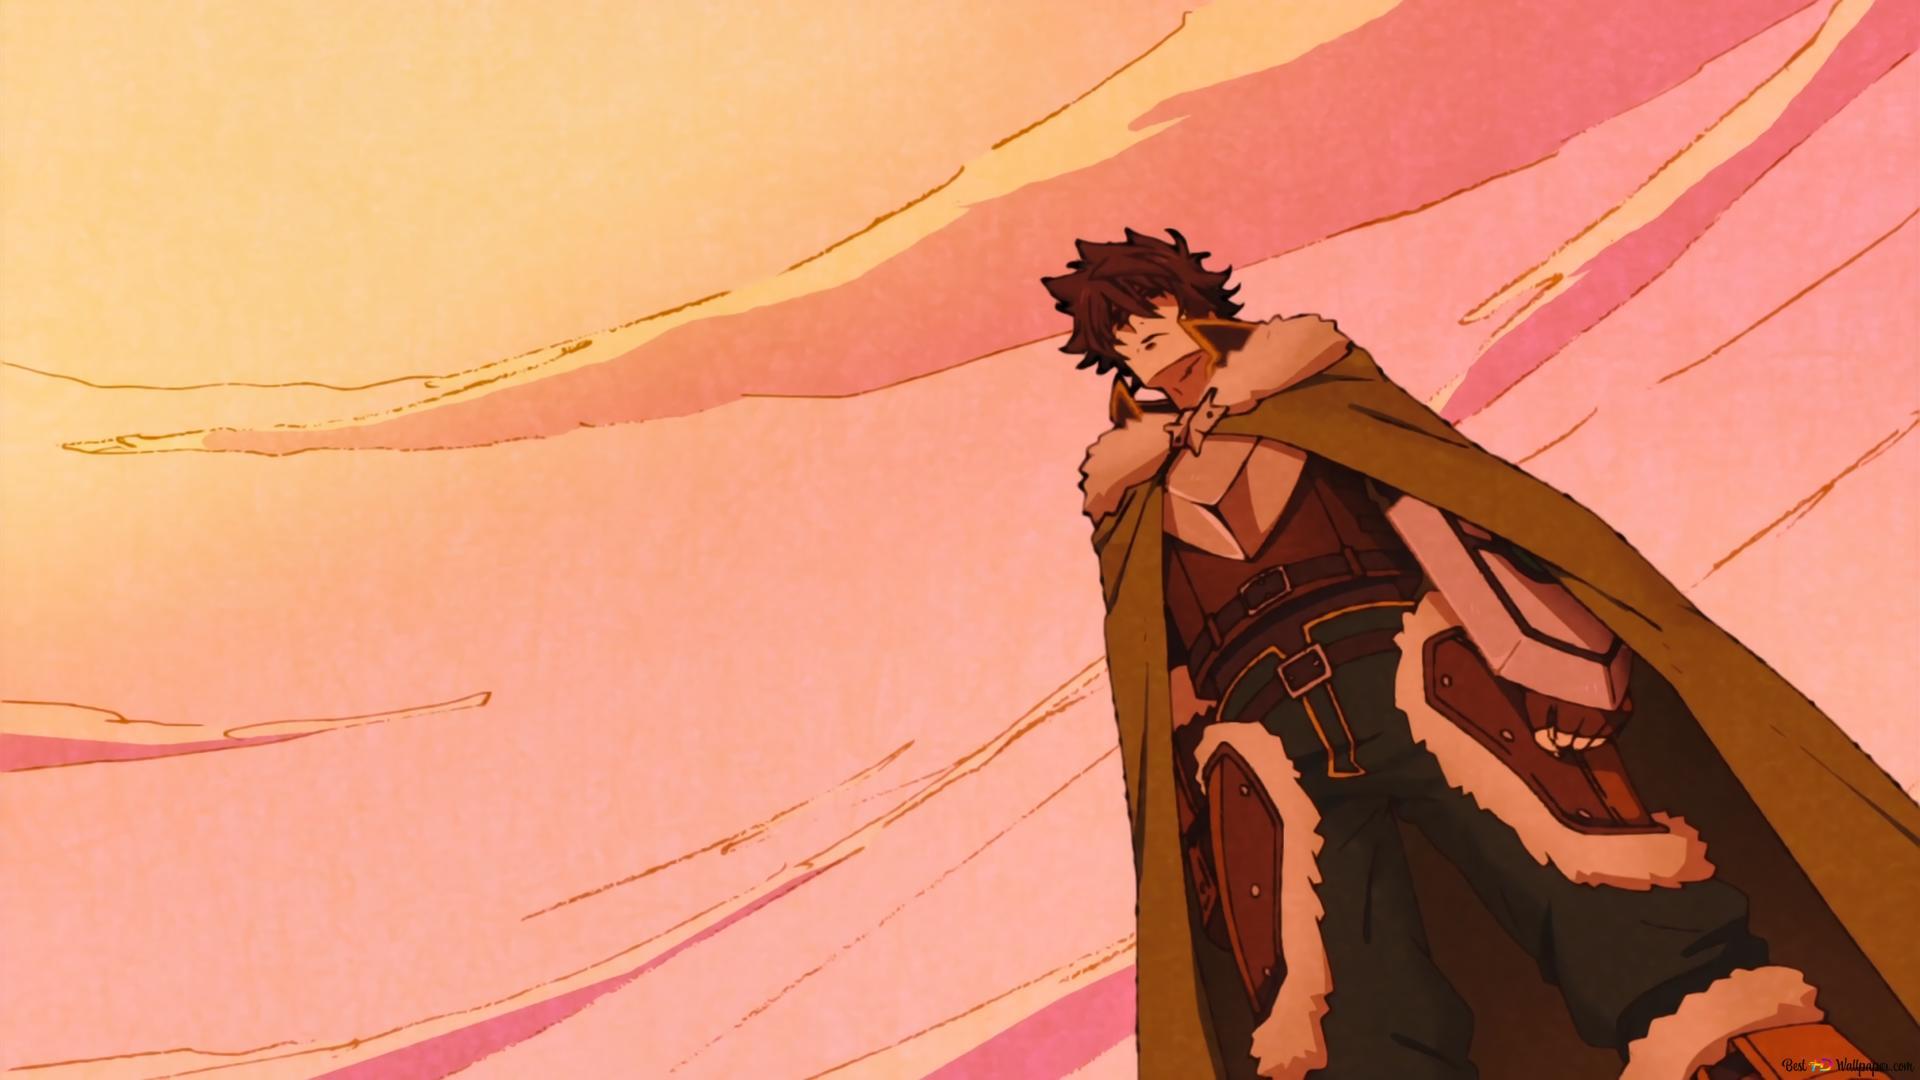 Naofumi Iwatani The Rising Of The Shield Hero Hd Wallpaper Download